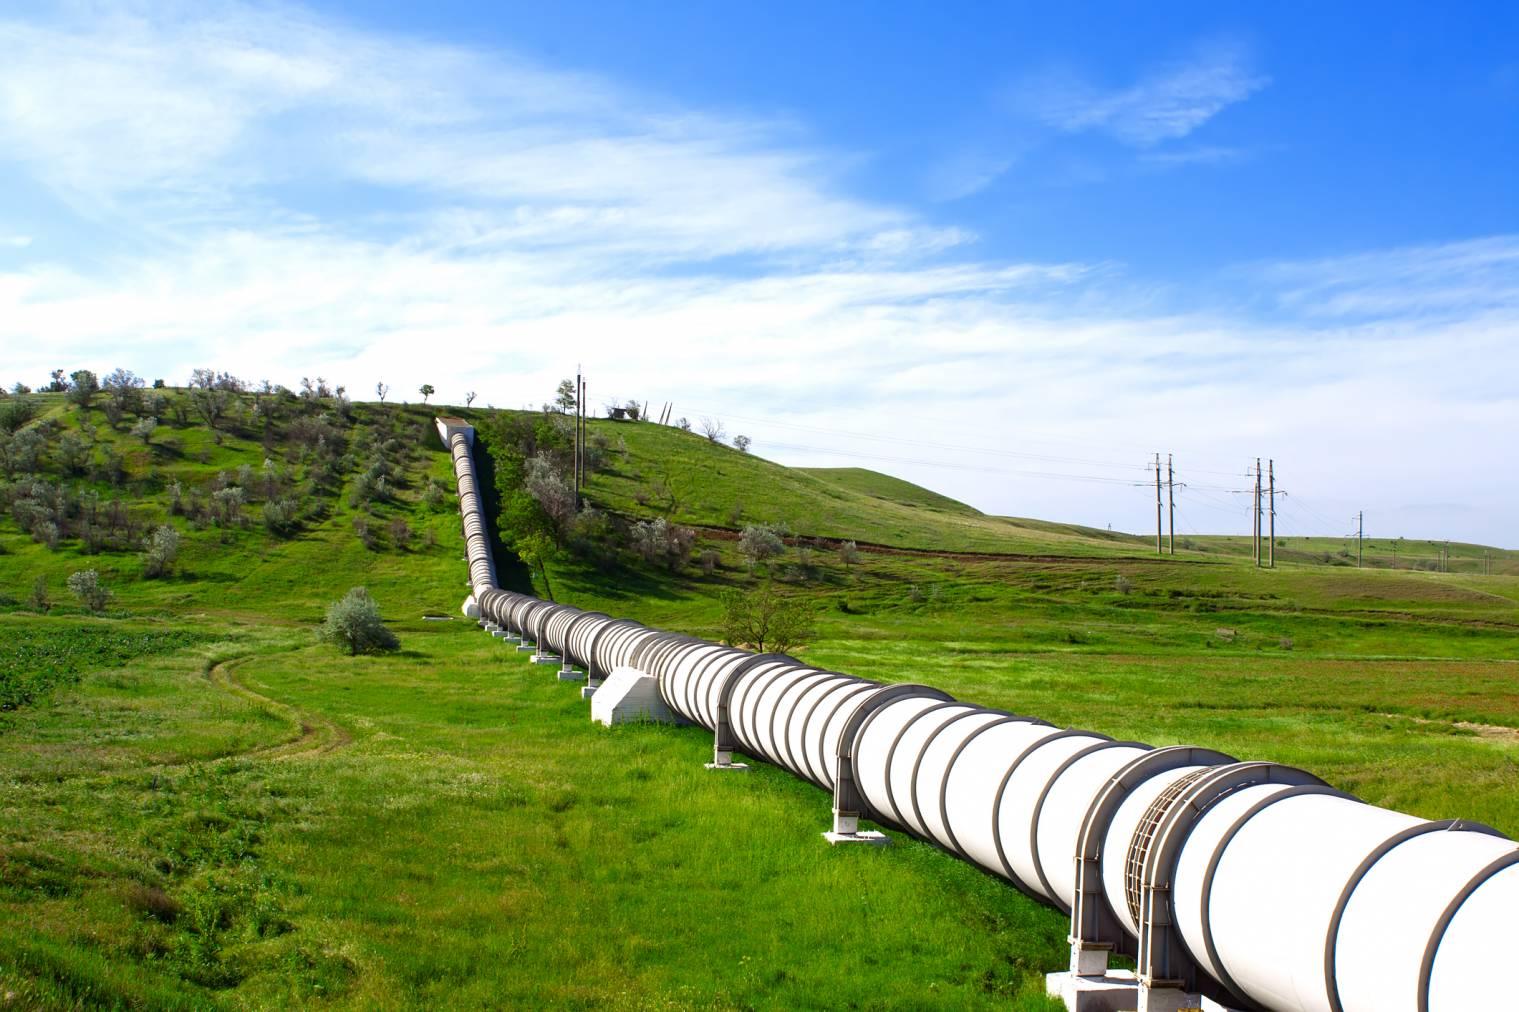 Transport de gaz par gazoducs